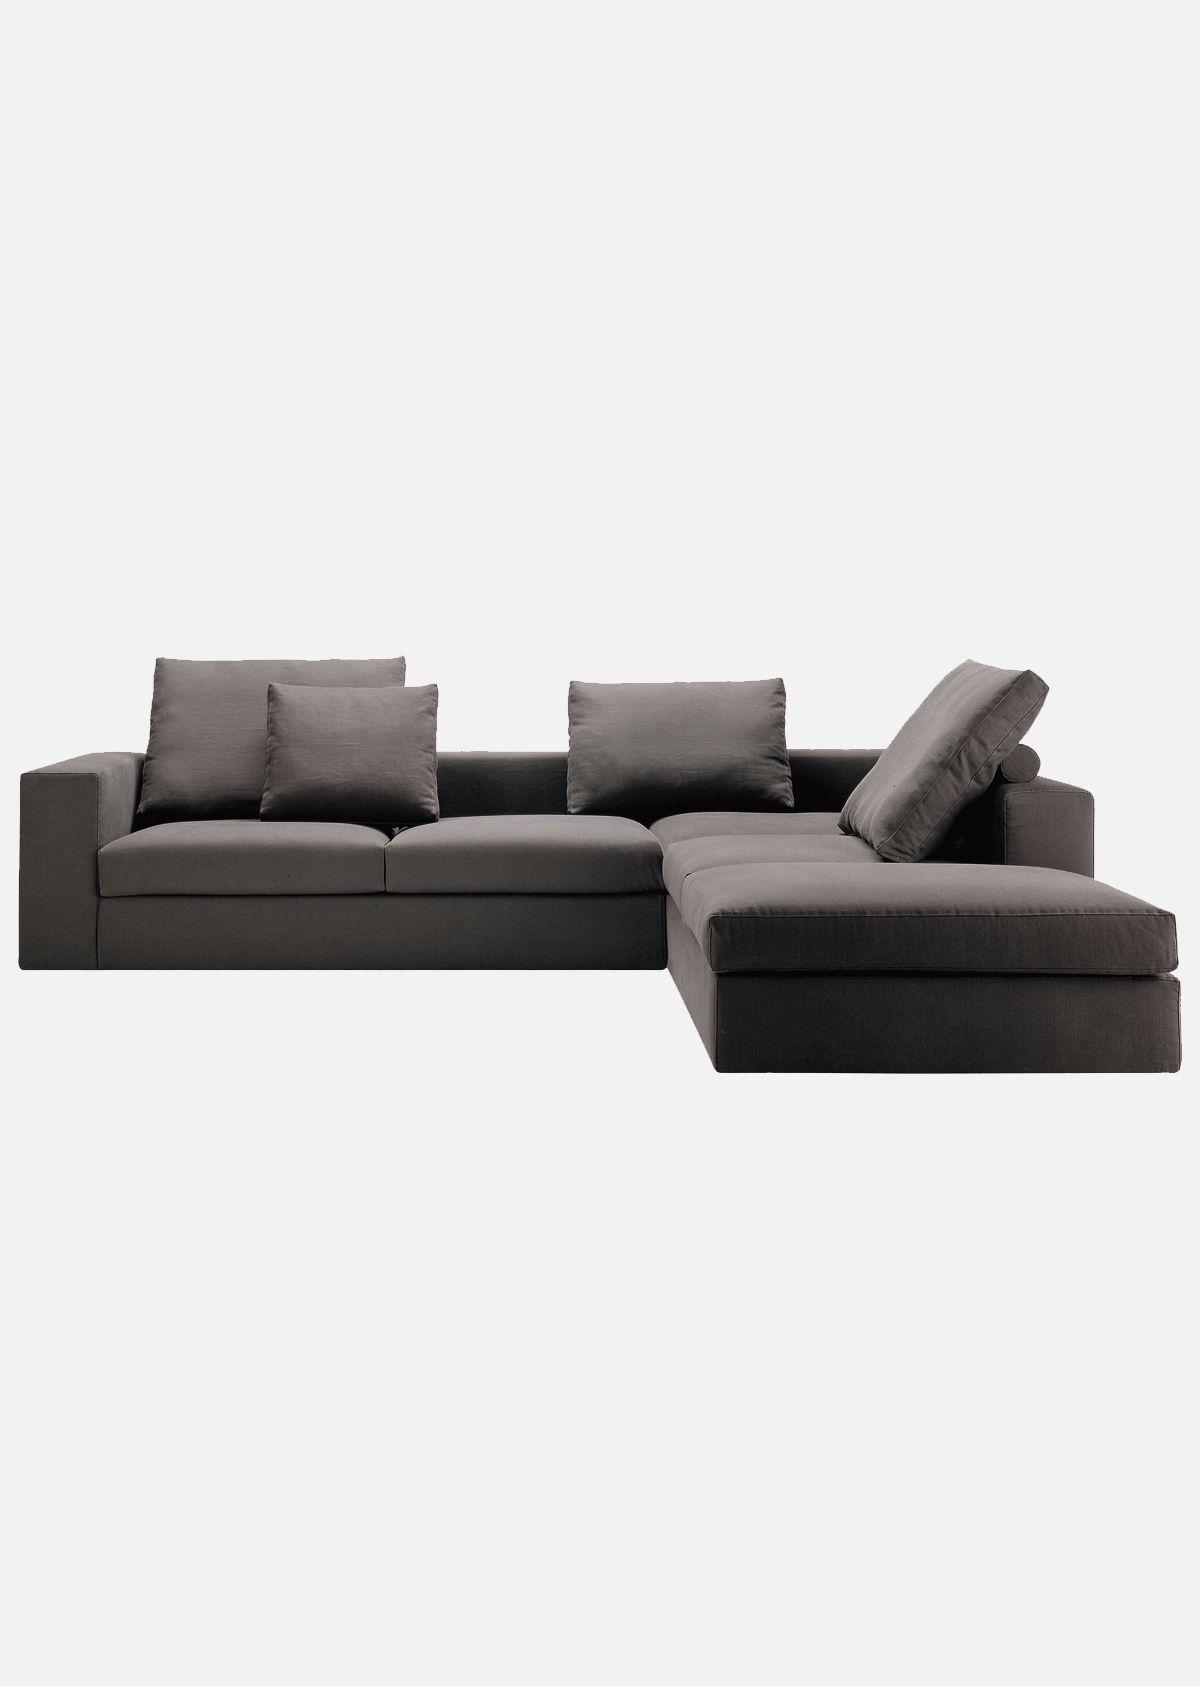 zanotta sofa bed chill interio ソファ koochy by デザイン karim rashid